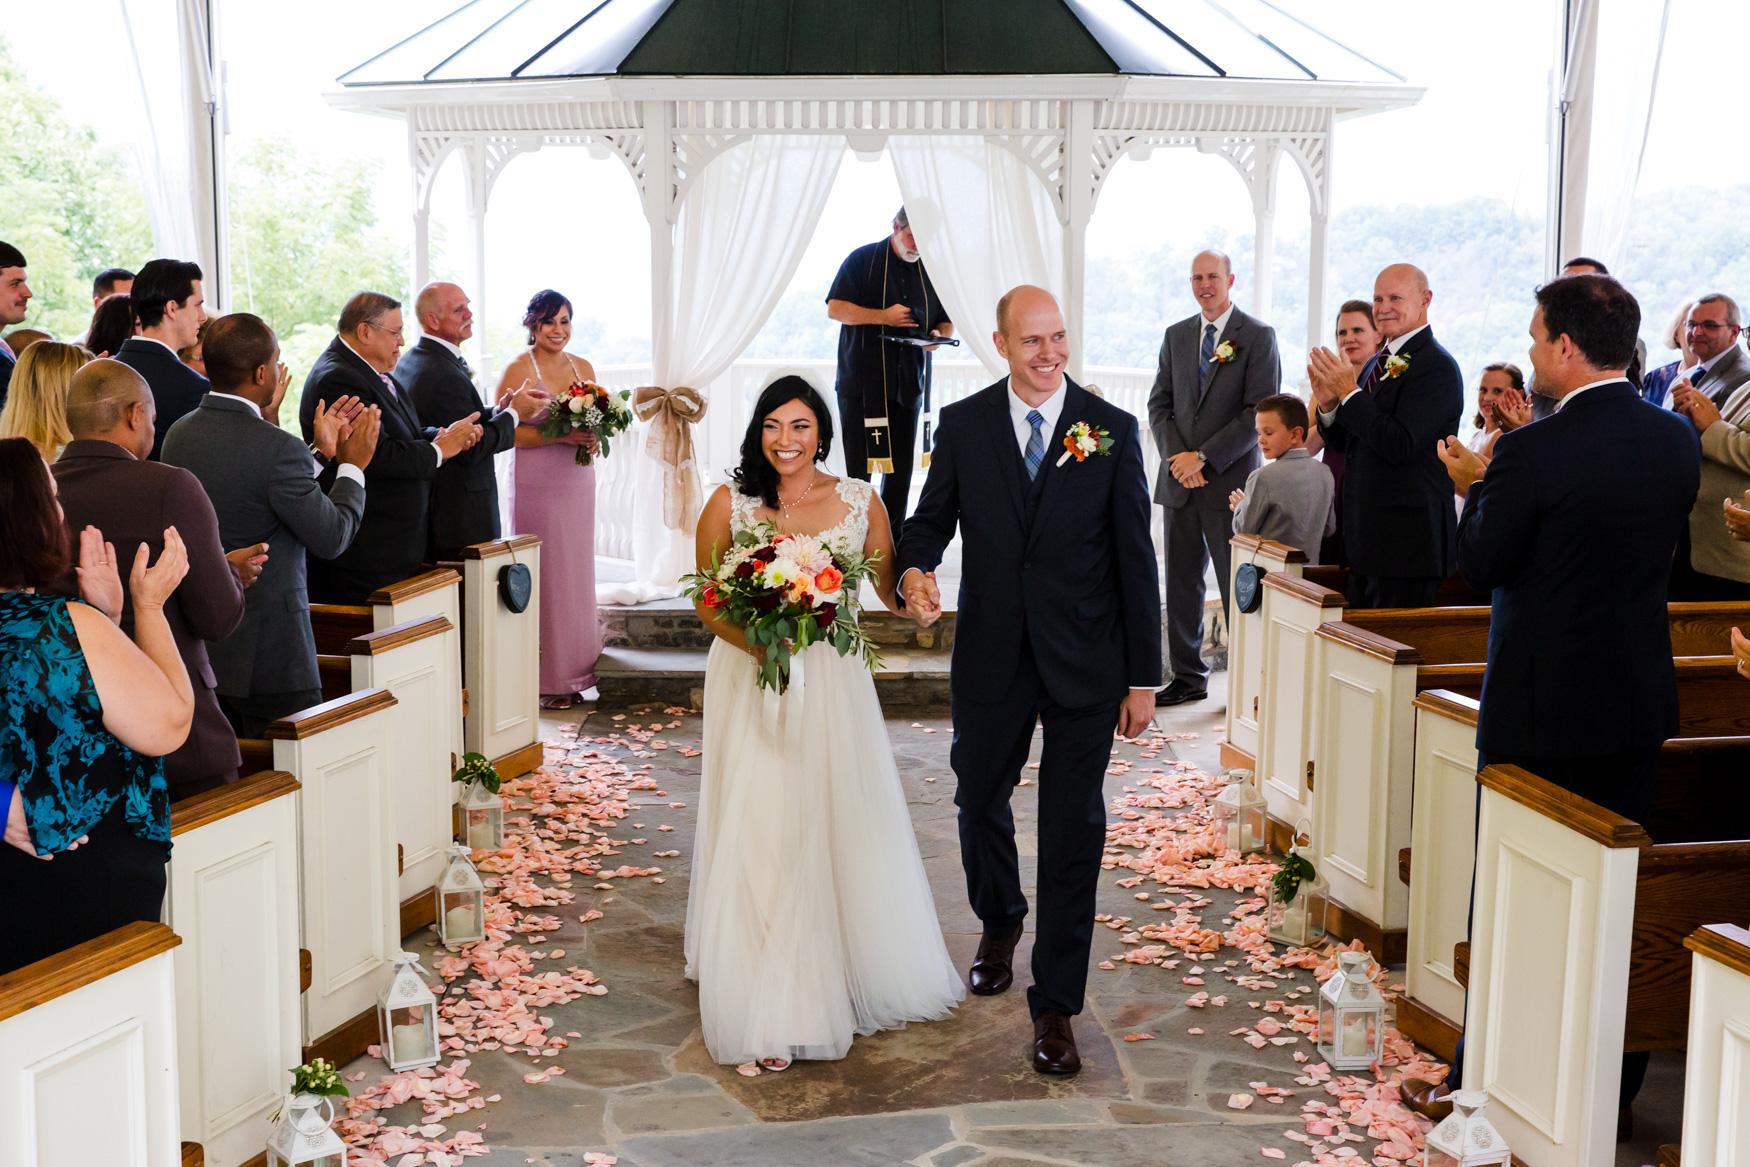 Wedding Ceremony Exit Waynesville NC Wedding Photography Inn at Tranquility Farm